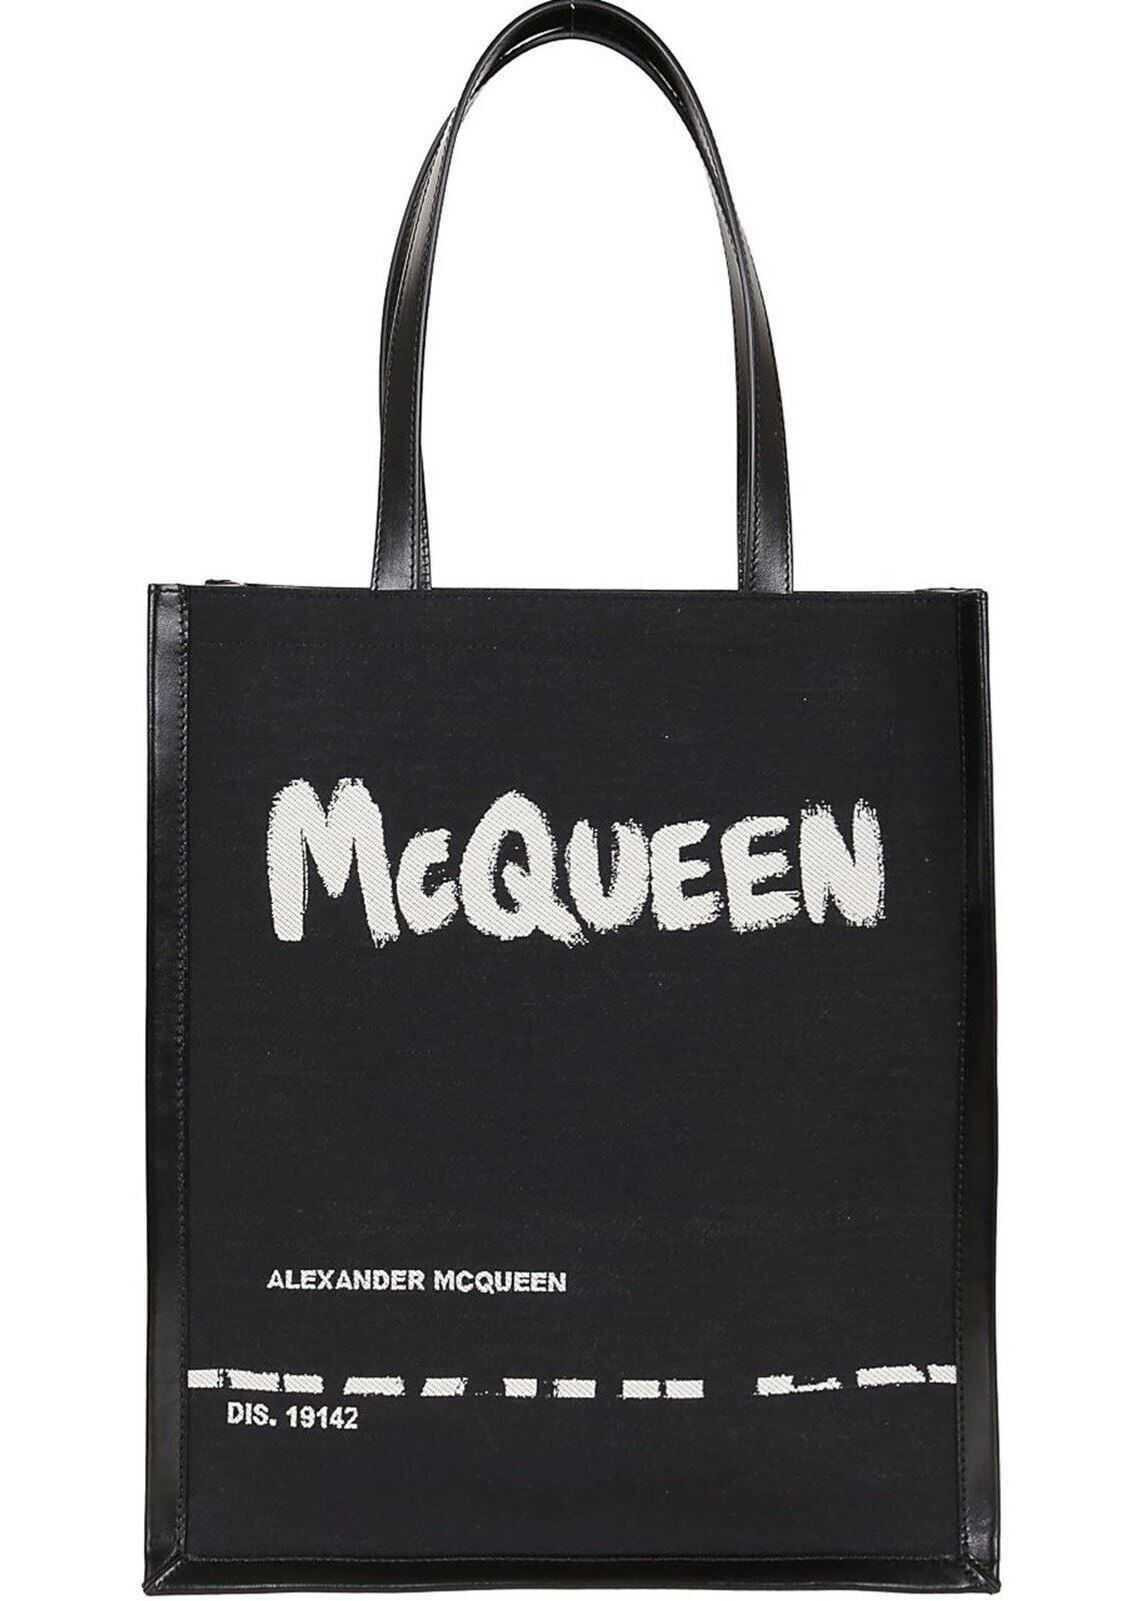 Alexander McQueen Graffiti Logo Tote Bag In Black 625509 2B410 1073 Black imagine b-mall.ro